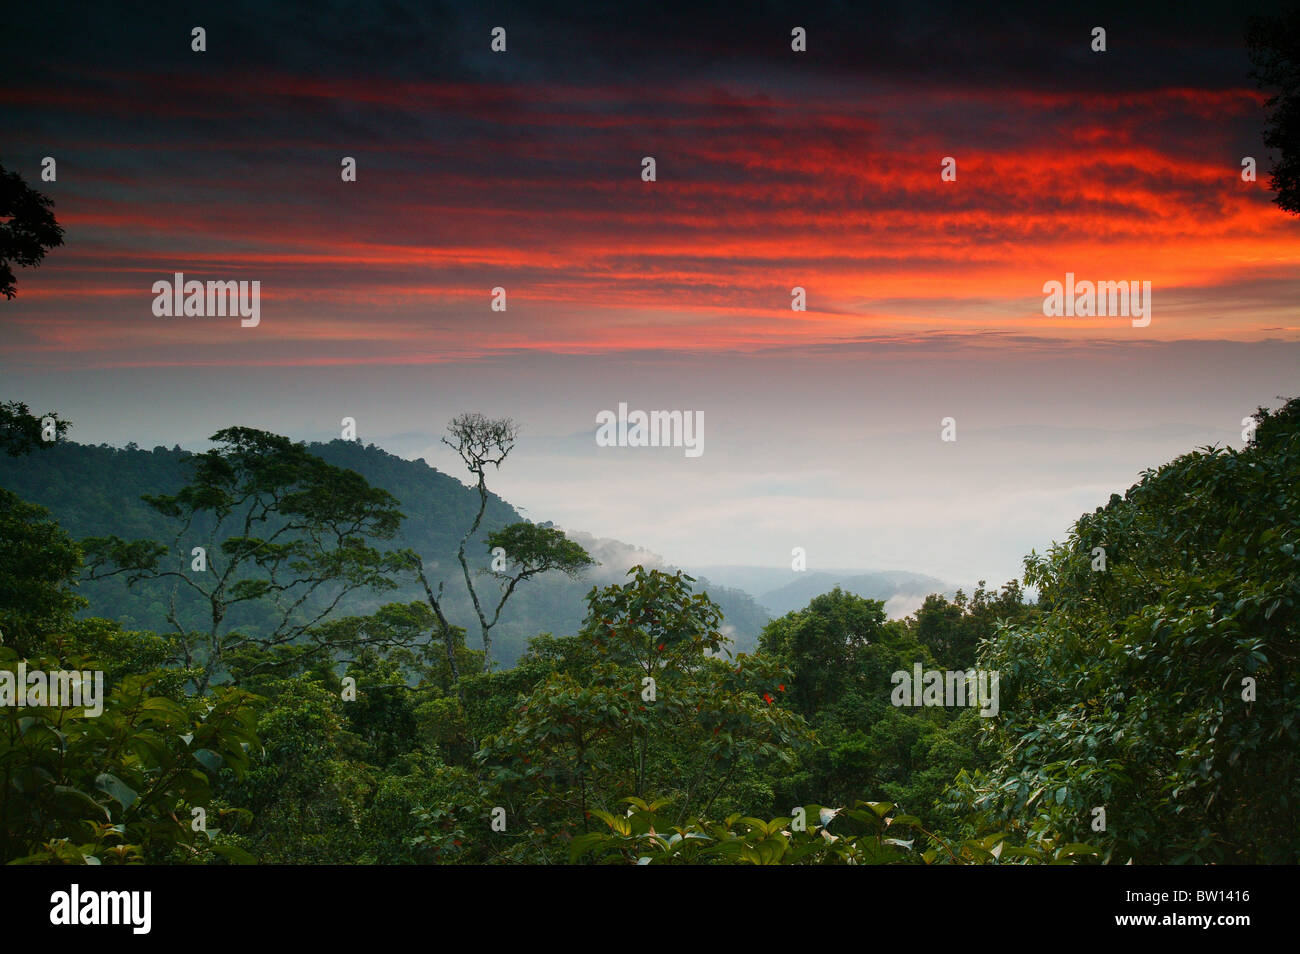 Dawn at Cerro Pirre, in Darien national park, Darien province, Republic of Panama. Stock Photo